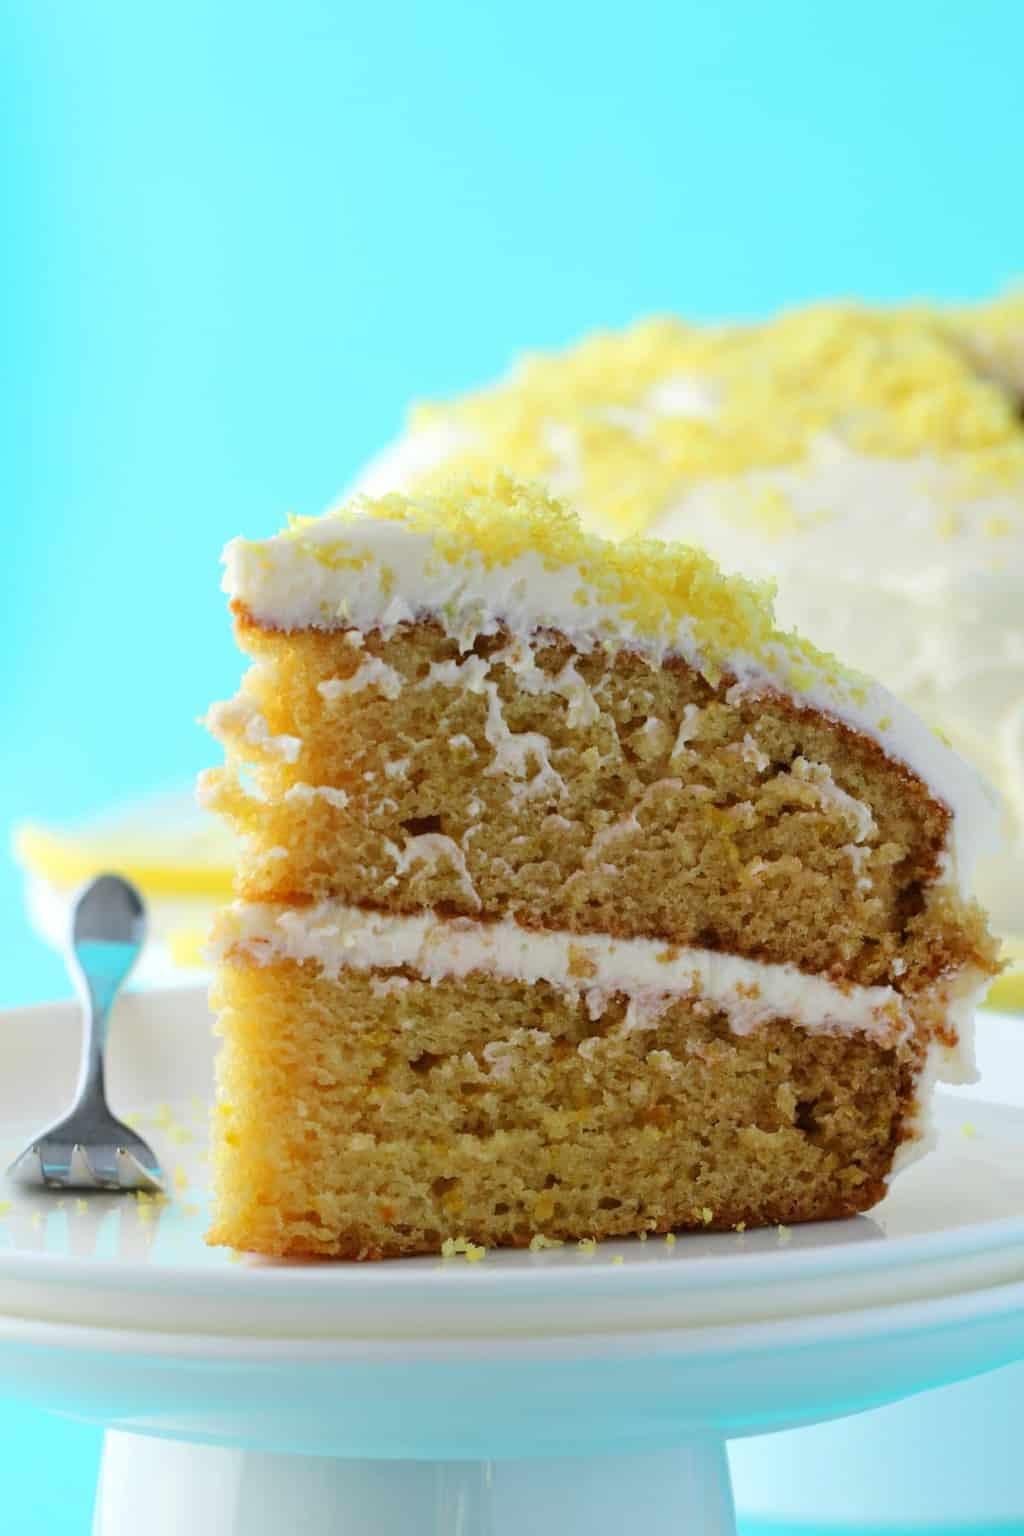 Vegan Lemon Cake Recipes  Vegan Lemon Cake Spongey 2 Layer Dream Cake Loving It